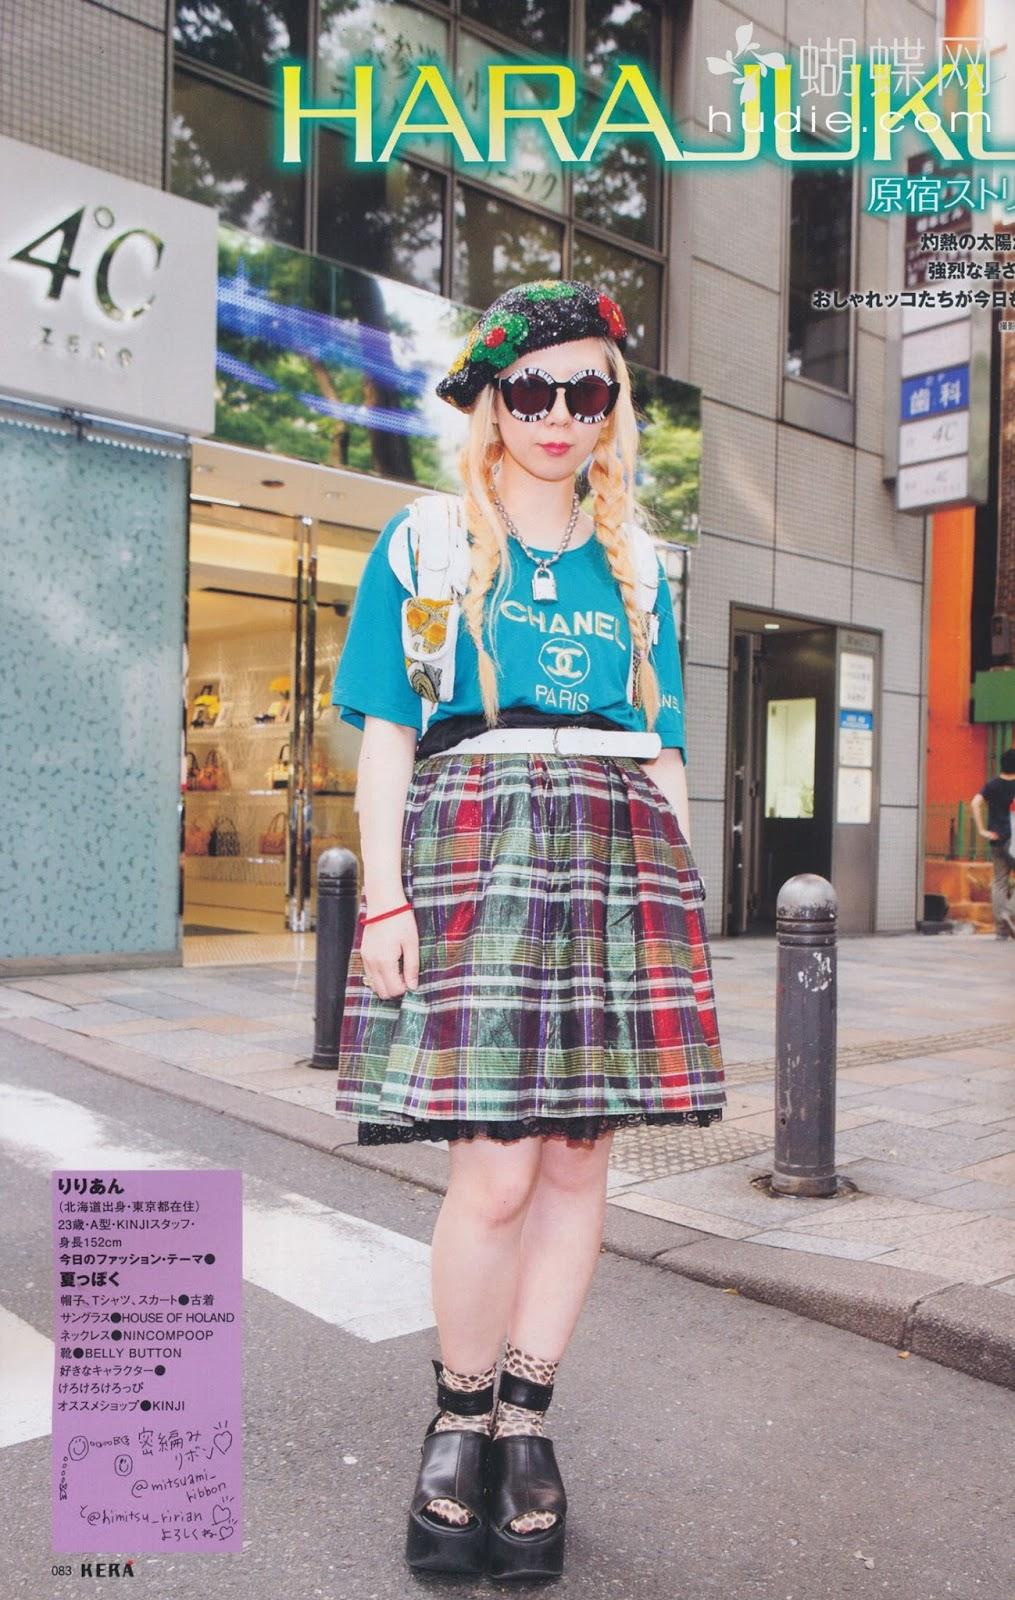 Harajuku Street Snaps